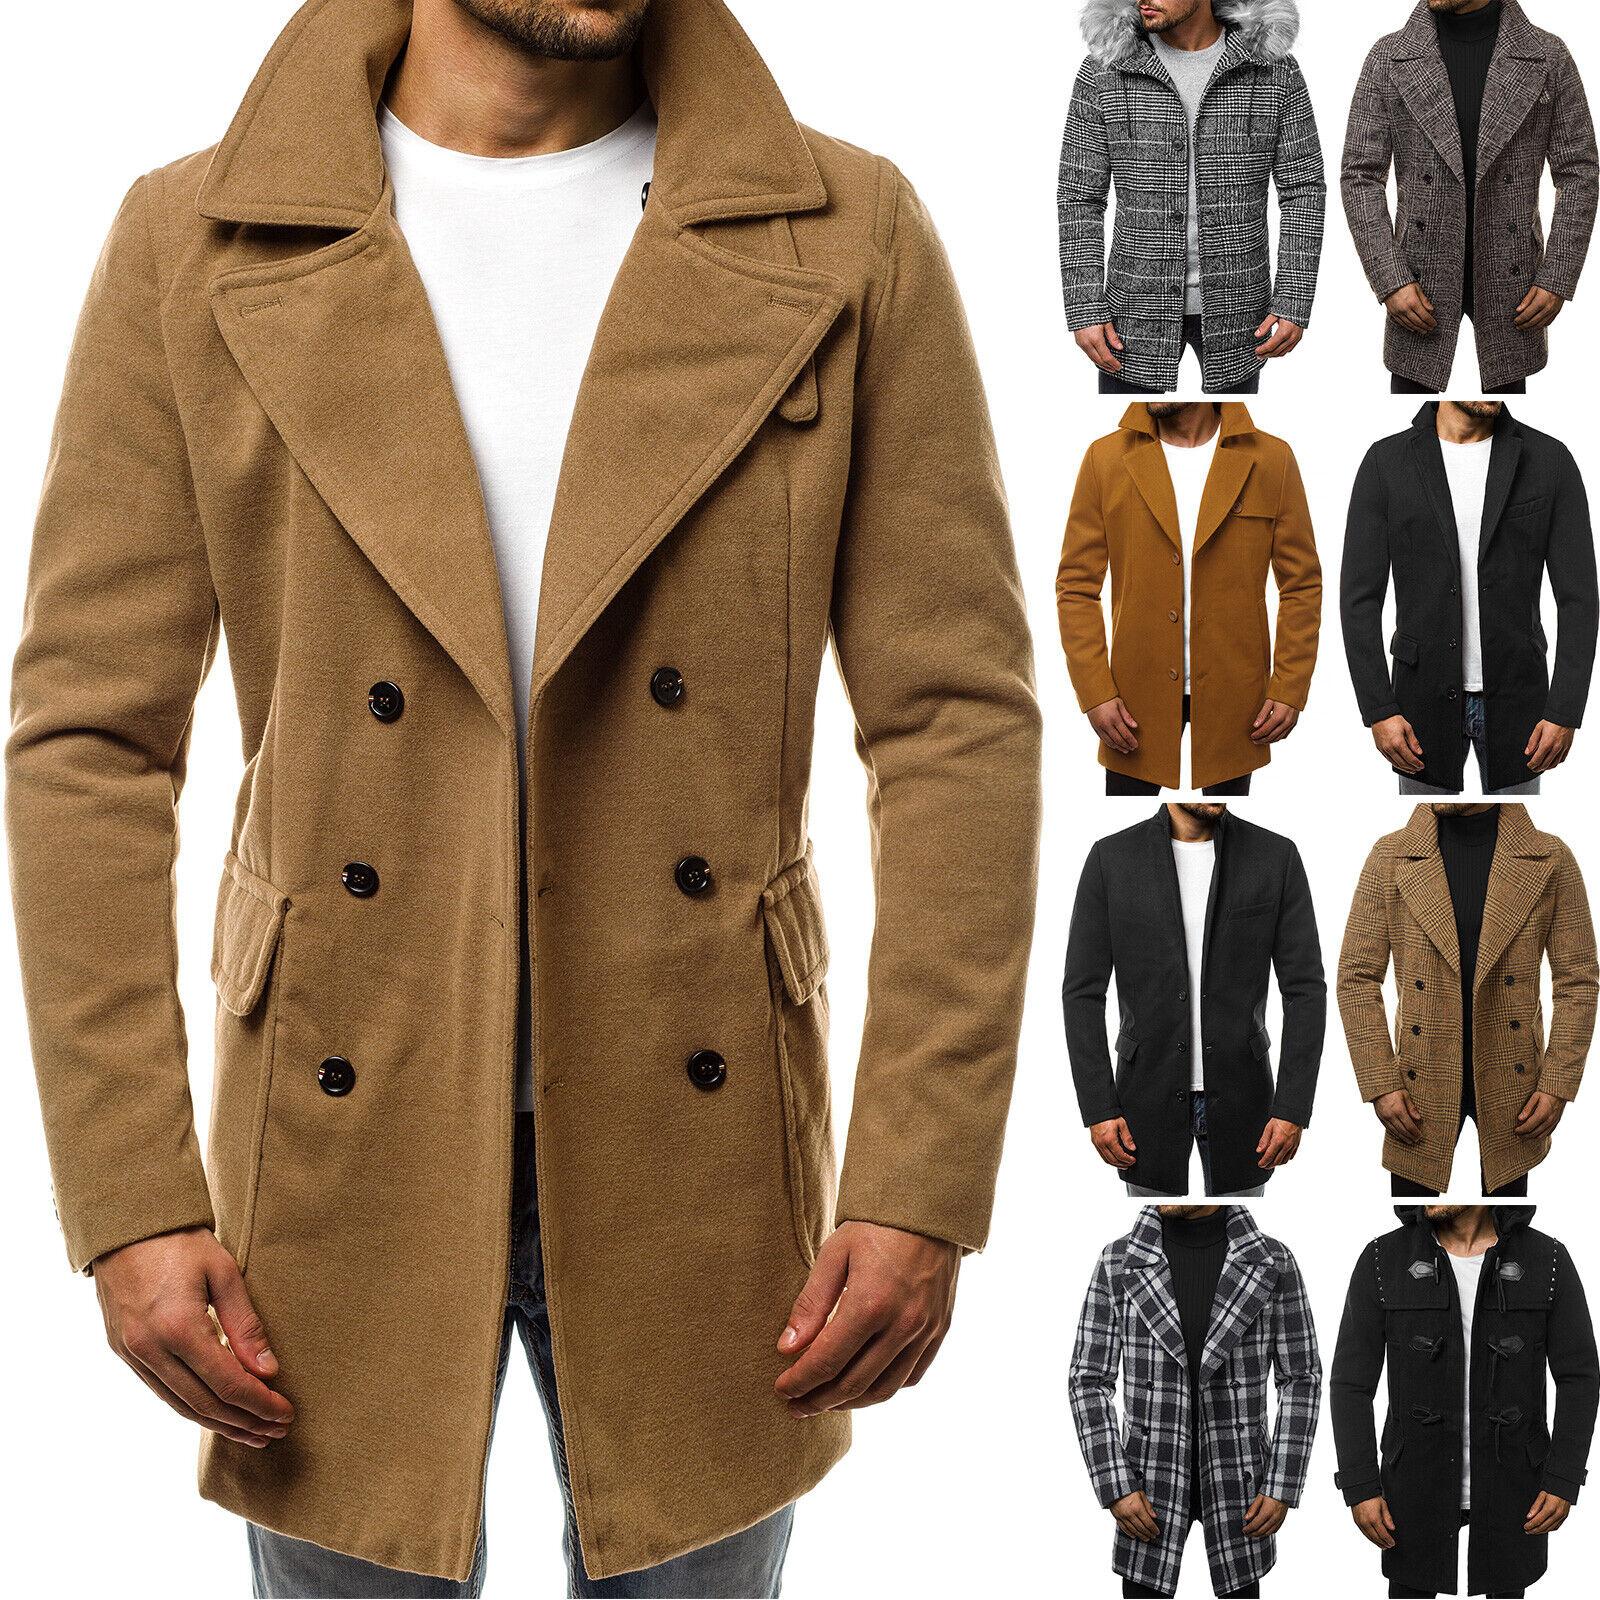 Mantel Übergangs Jacke Coat Sakko Classic Winter Casual Herren OZONEE 7782 MIX